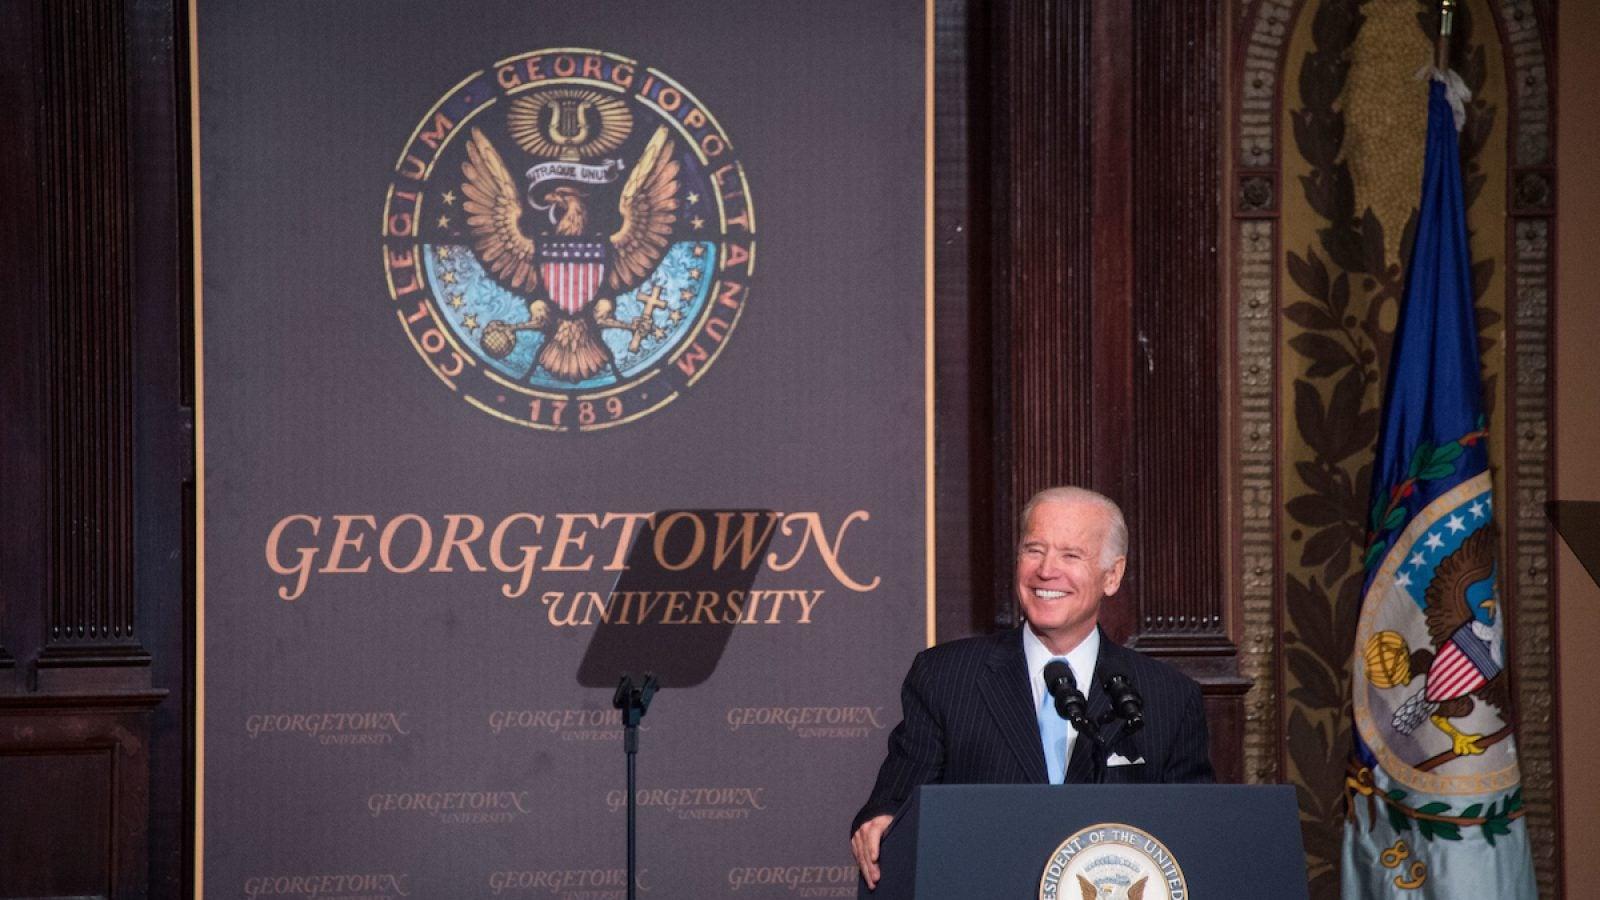 Vice President Joe Biden speaking at Gaston Hall on December 5, 2016